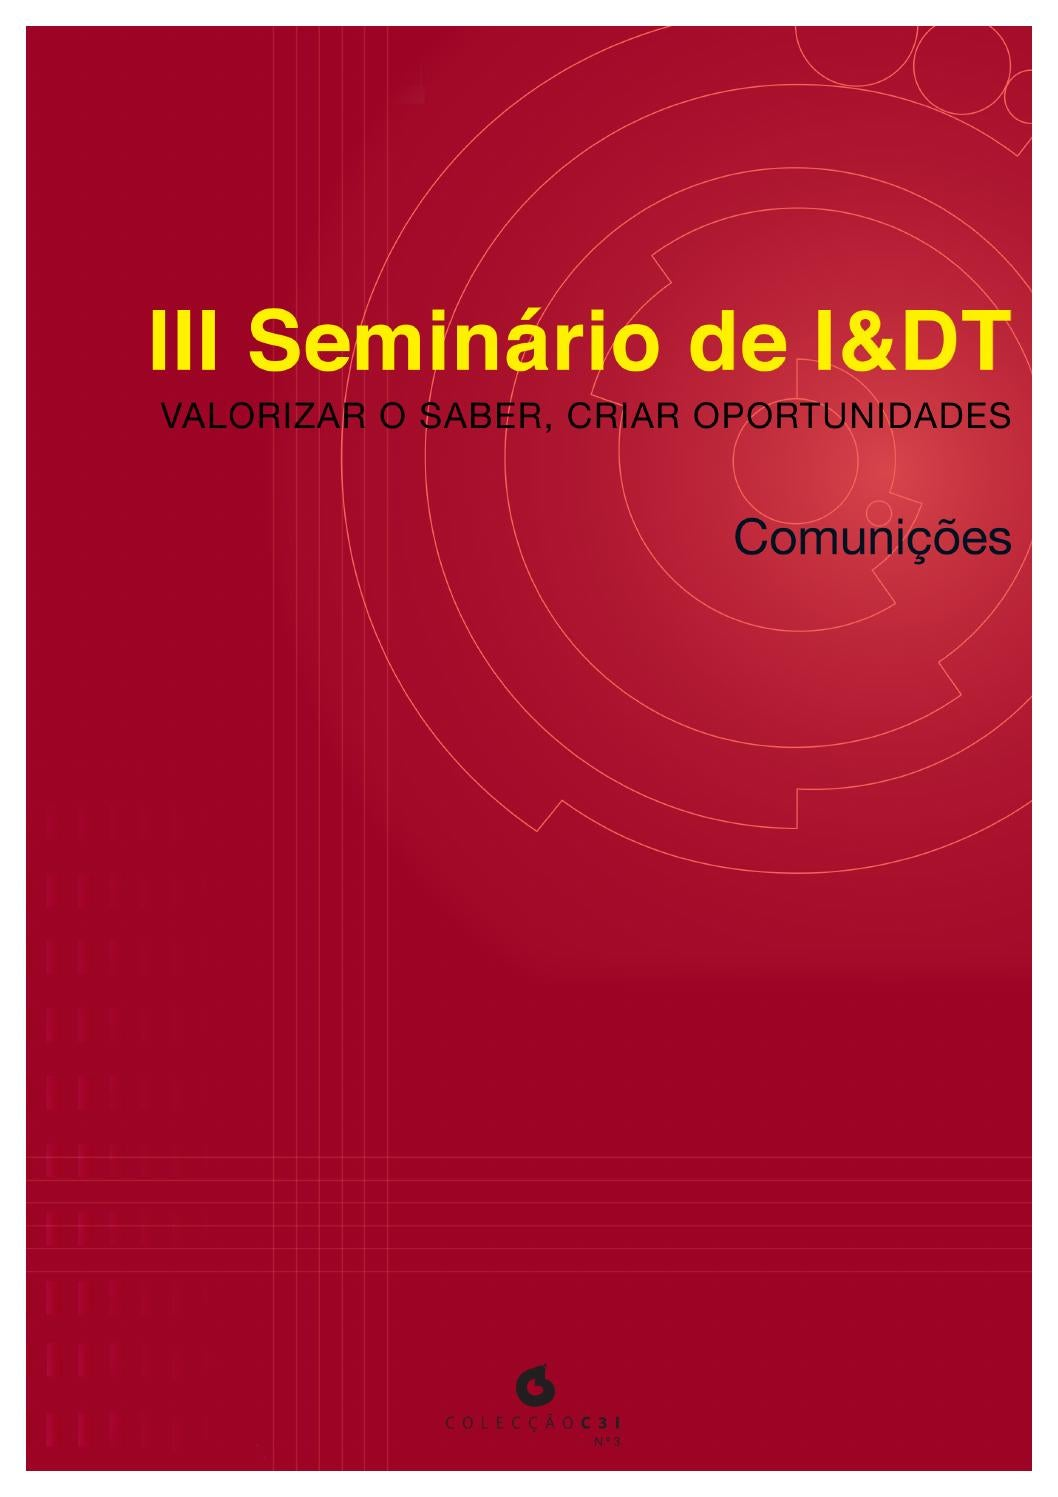 b35f37cb40 Comunicacoes iii seminario idt vol1 by C3i IPP - issuu